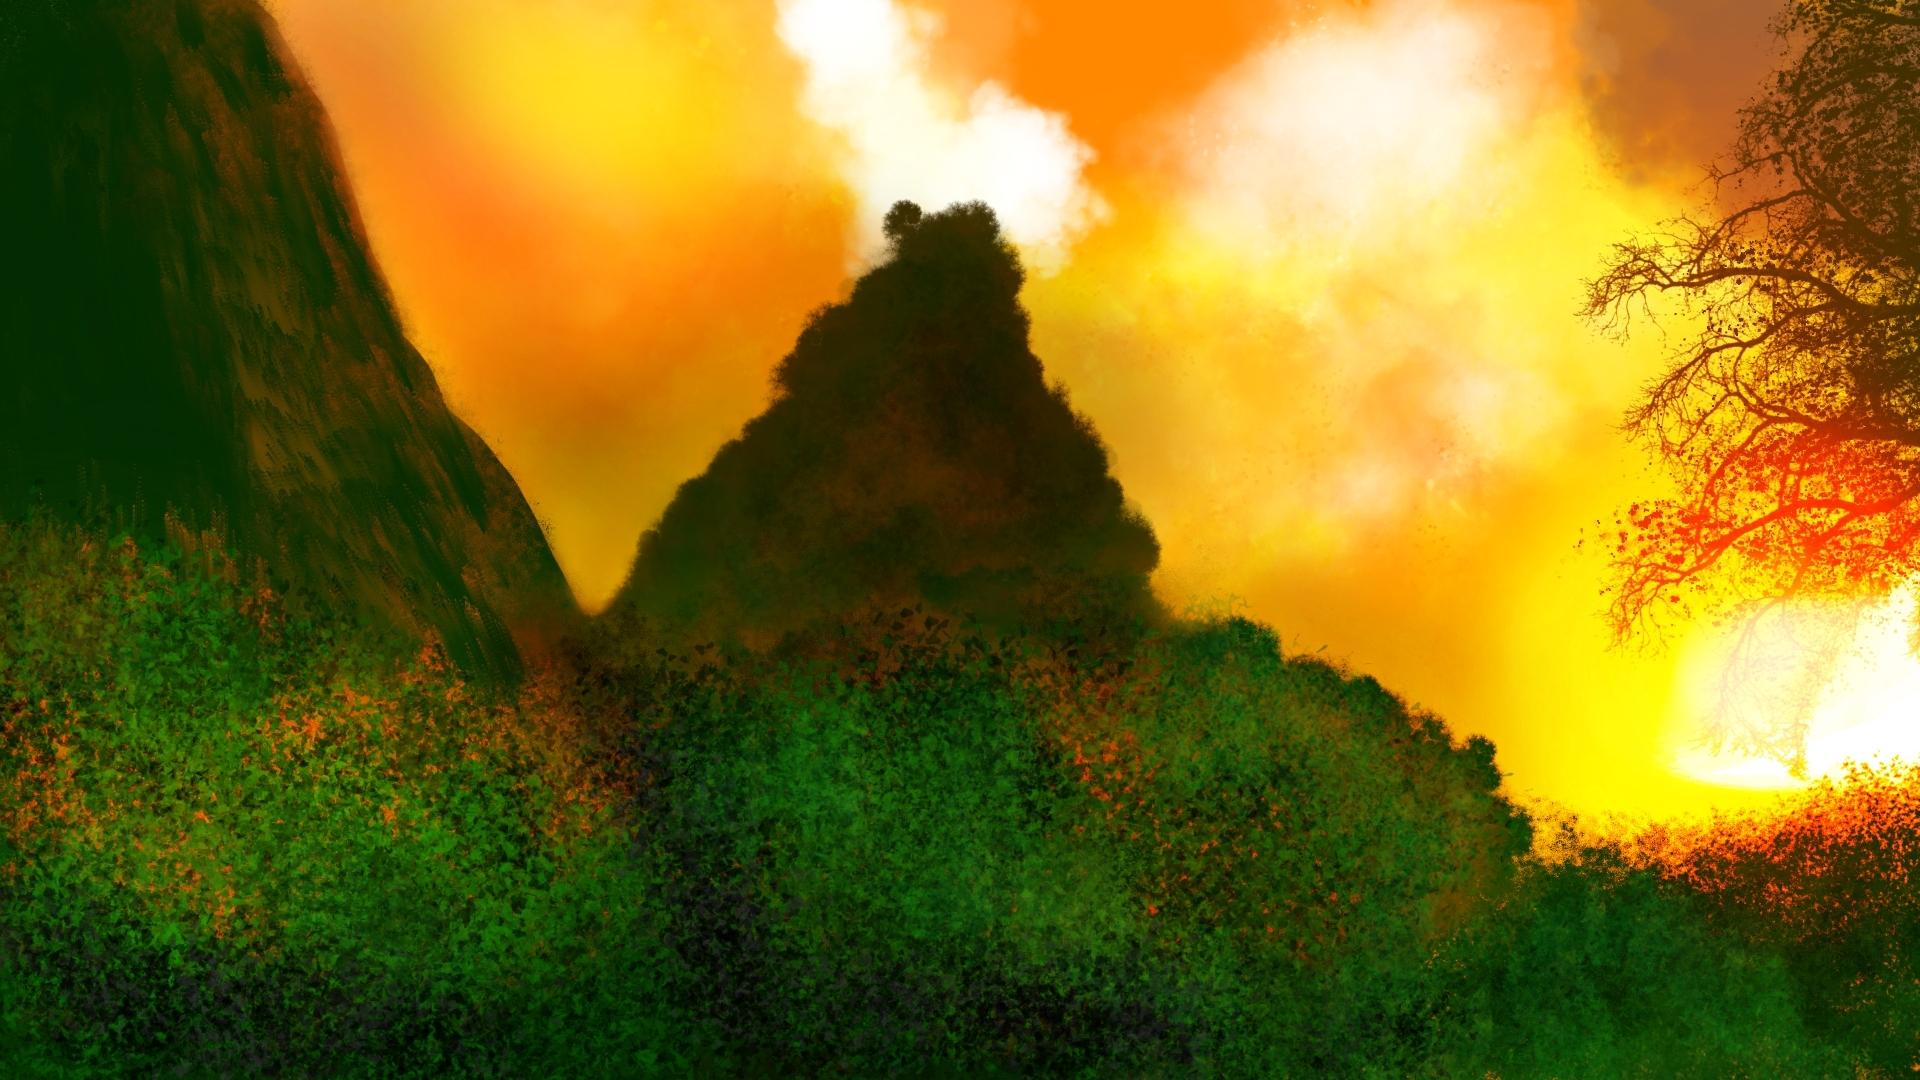 Digital Art Digital Painting Nature 1920x1080